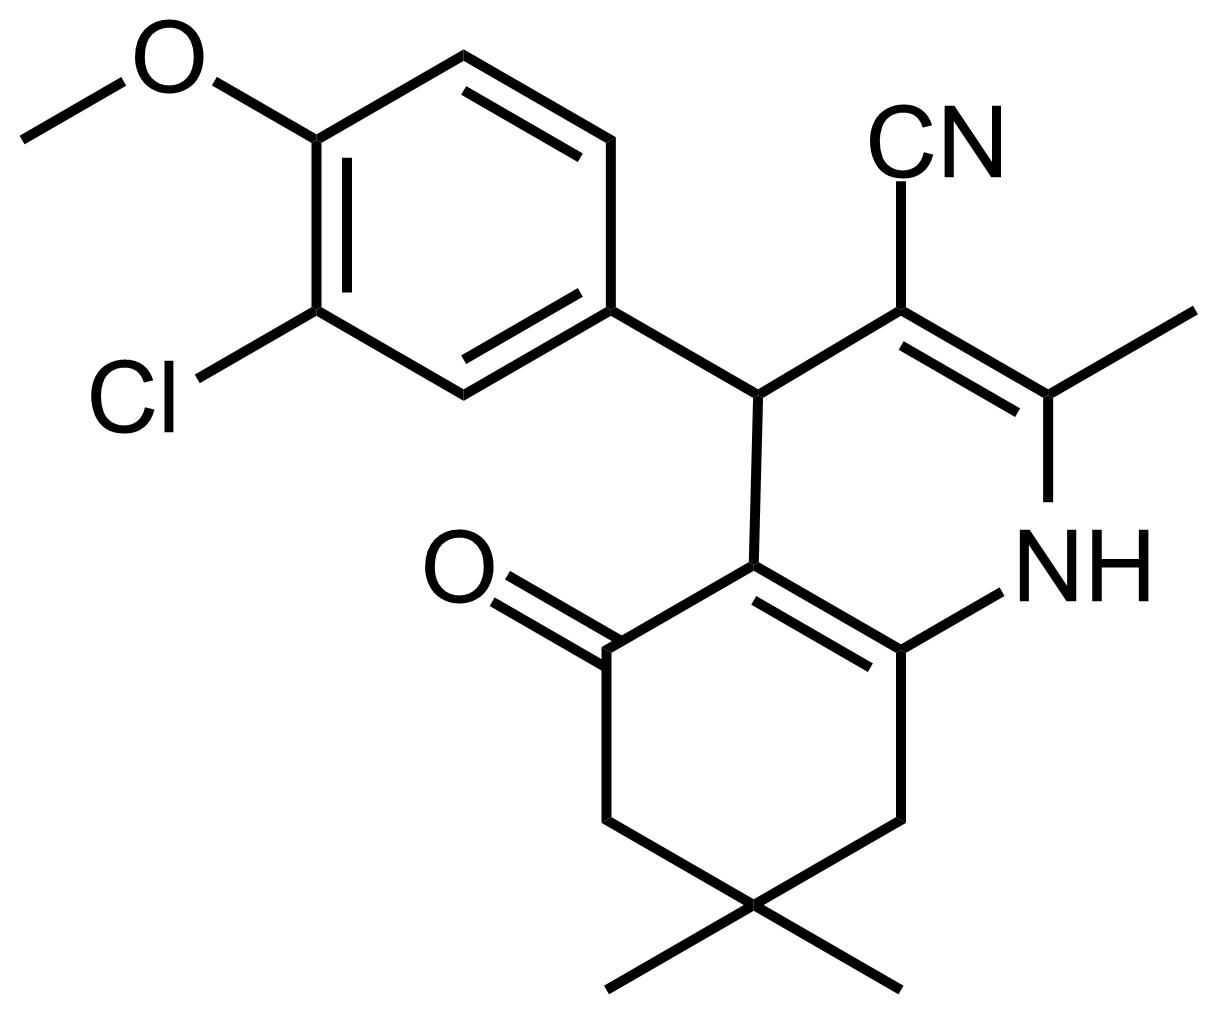 Structure of 4-(3-Chloro-4-methoxyphenyl)-2,7,7-trimethyl-5-oxo-1,4,5,6,7,8-hexahydroquinoline-3-carbonitrile